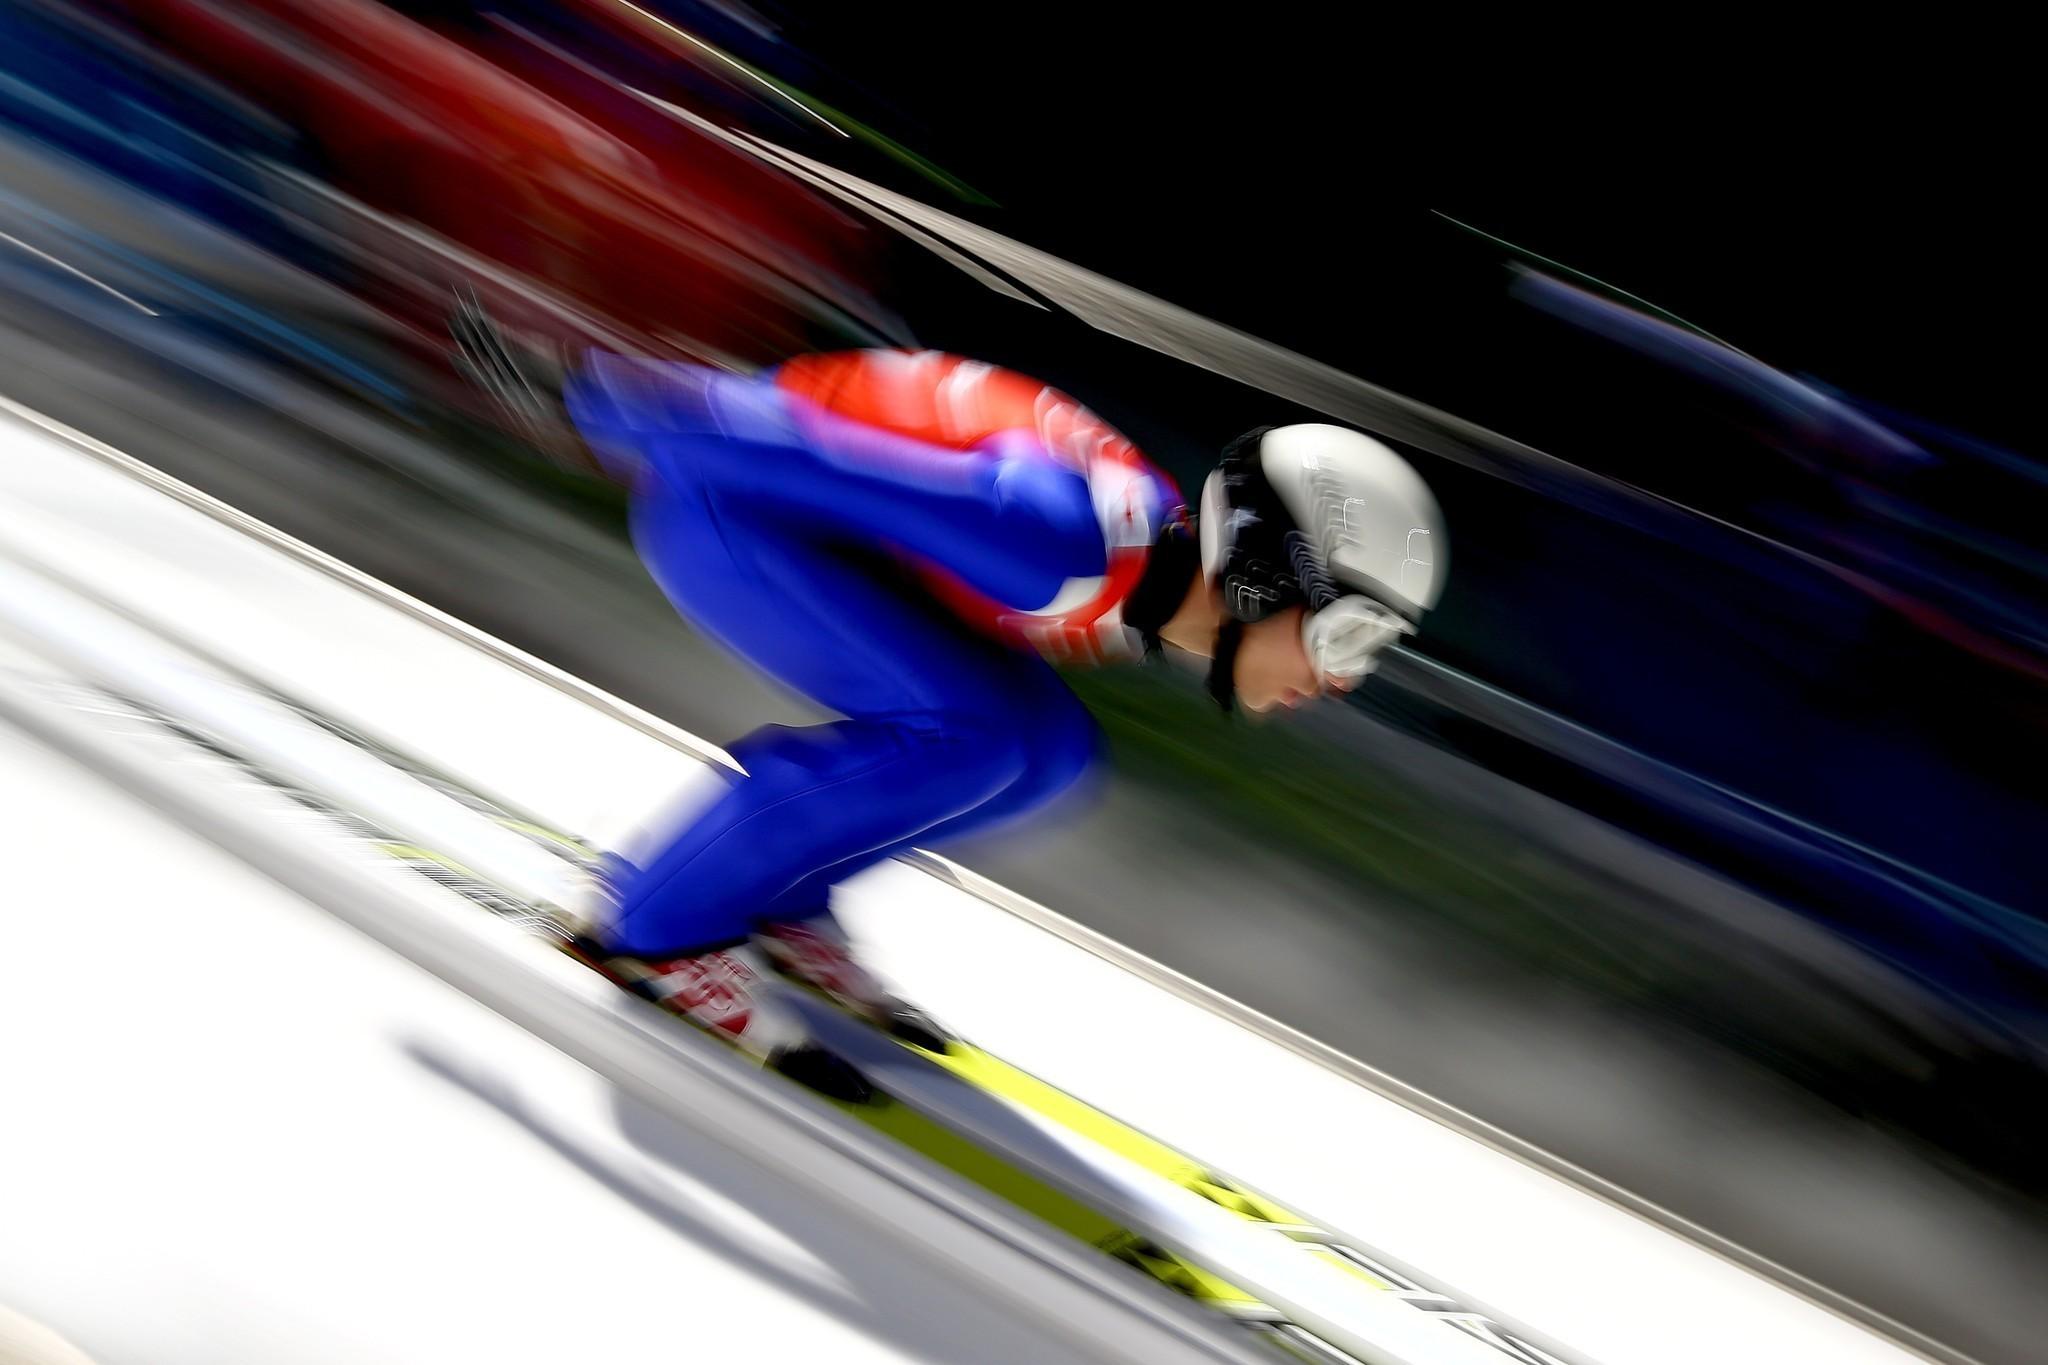 Bets on olympics best online sports betting sites ukraine